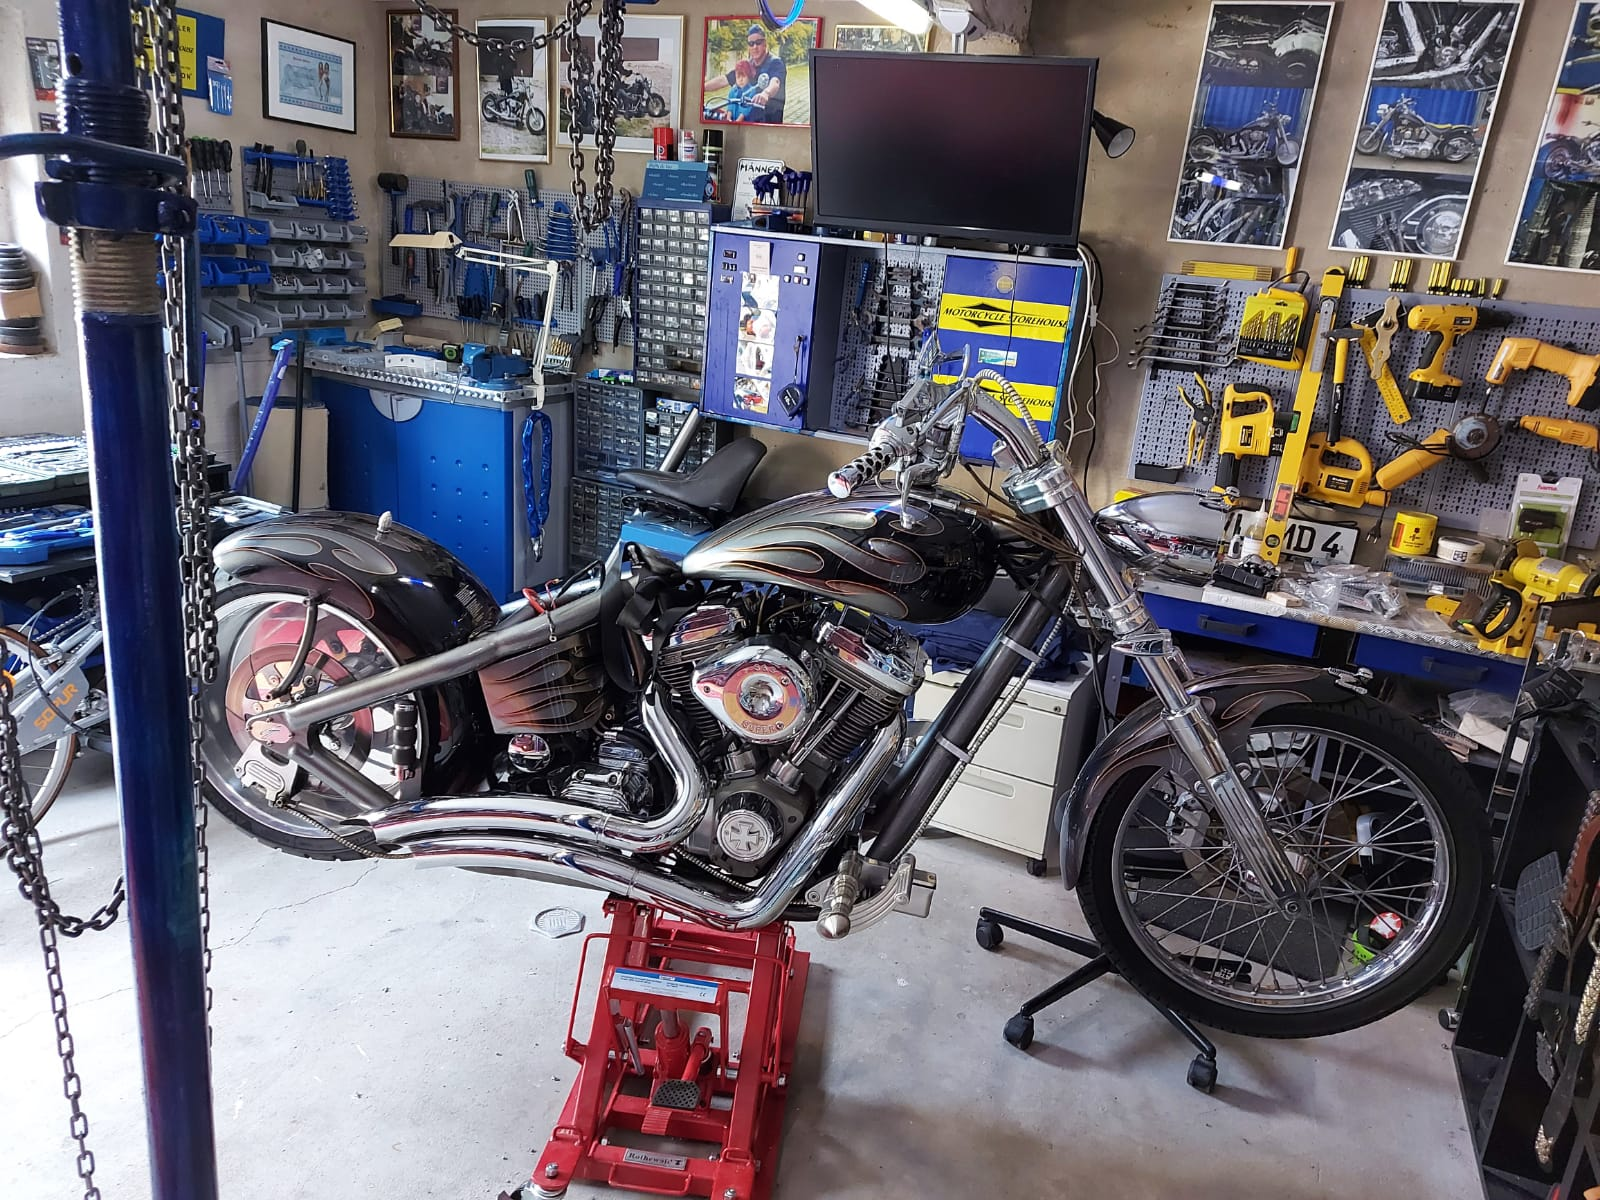 biker_shop_2021_05_25 (1)